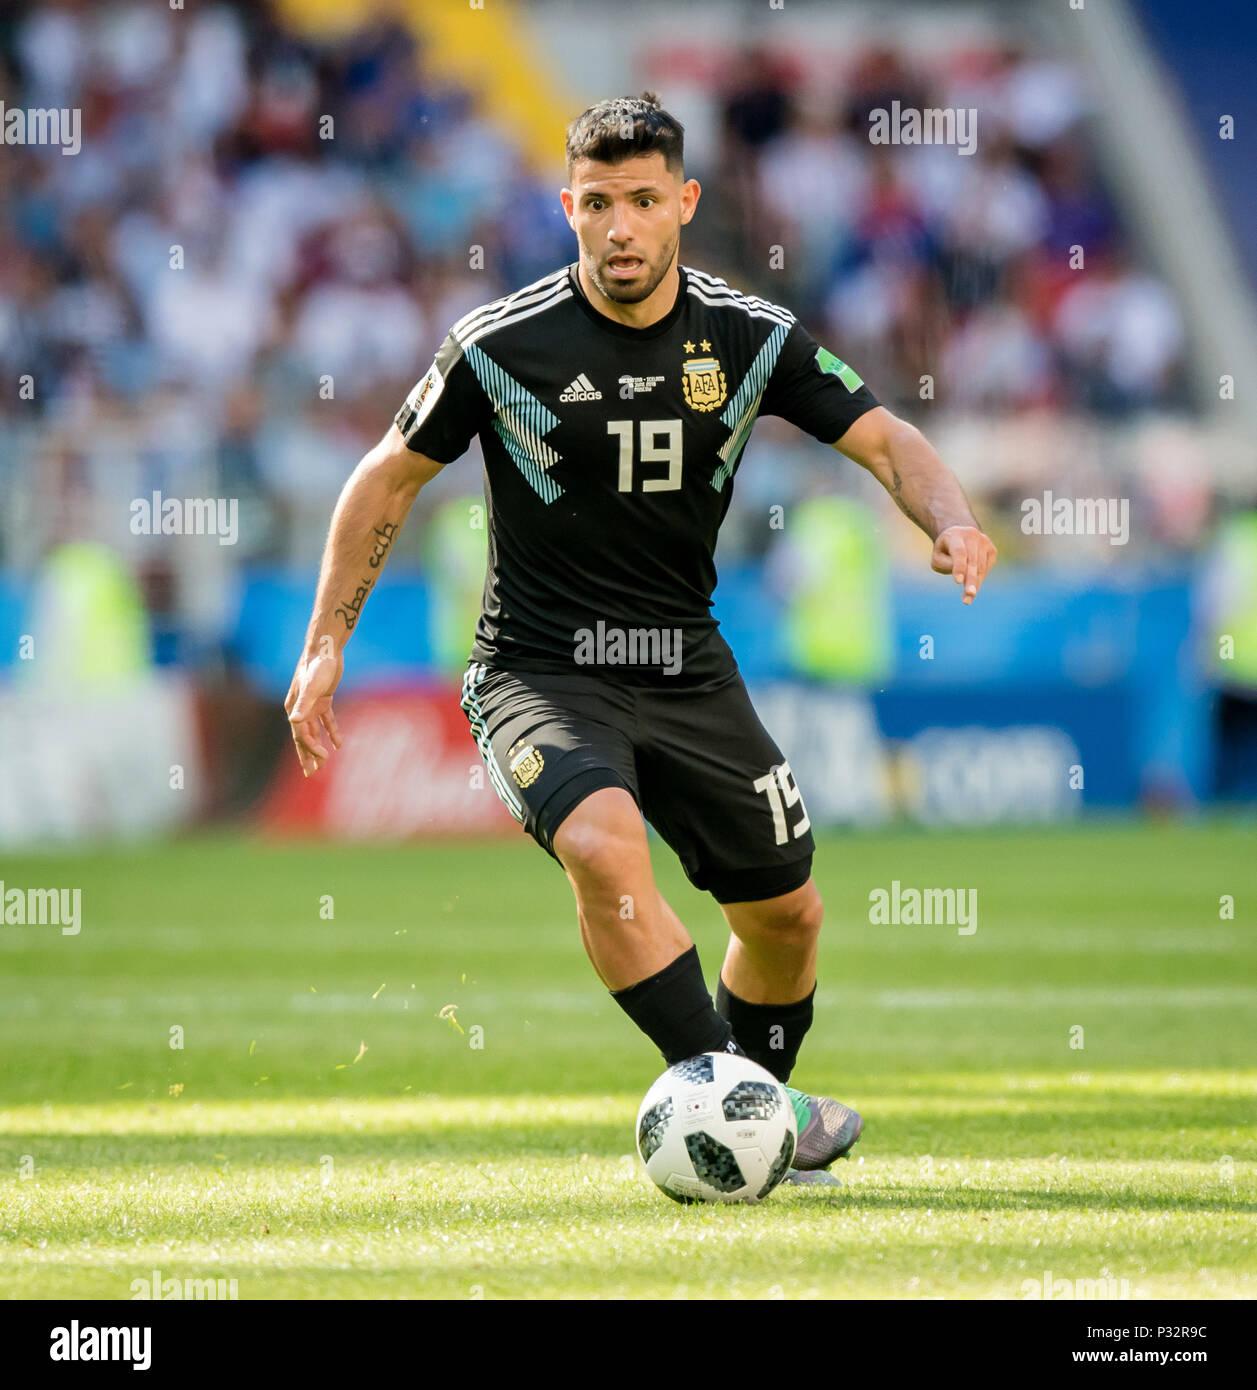 Coupe Du Monde 2018 Football Fifa Russie: Sergio Kun Aguero (Agueero) (Argentine) GES / Coupe Du